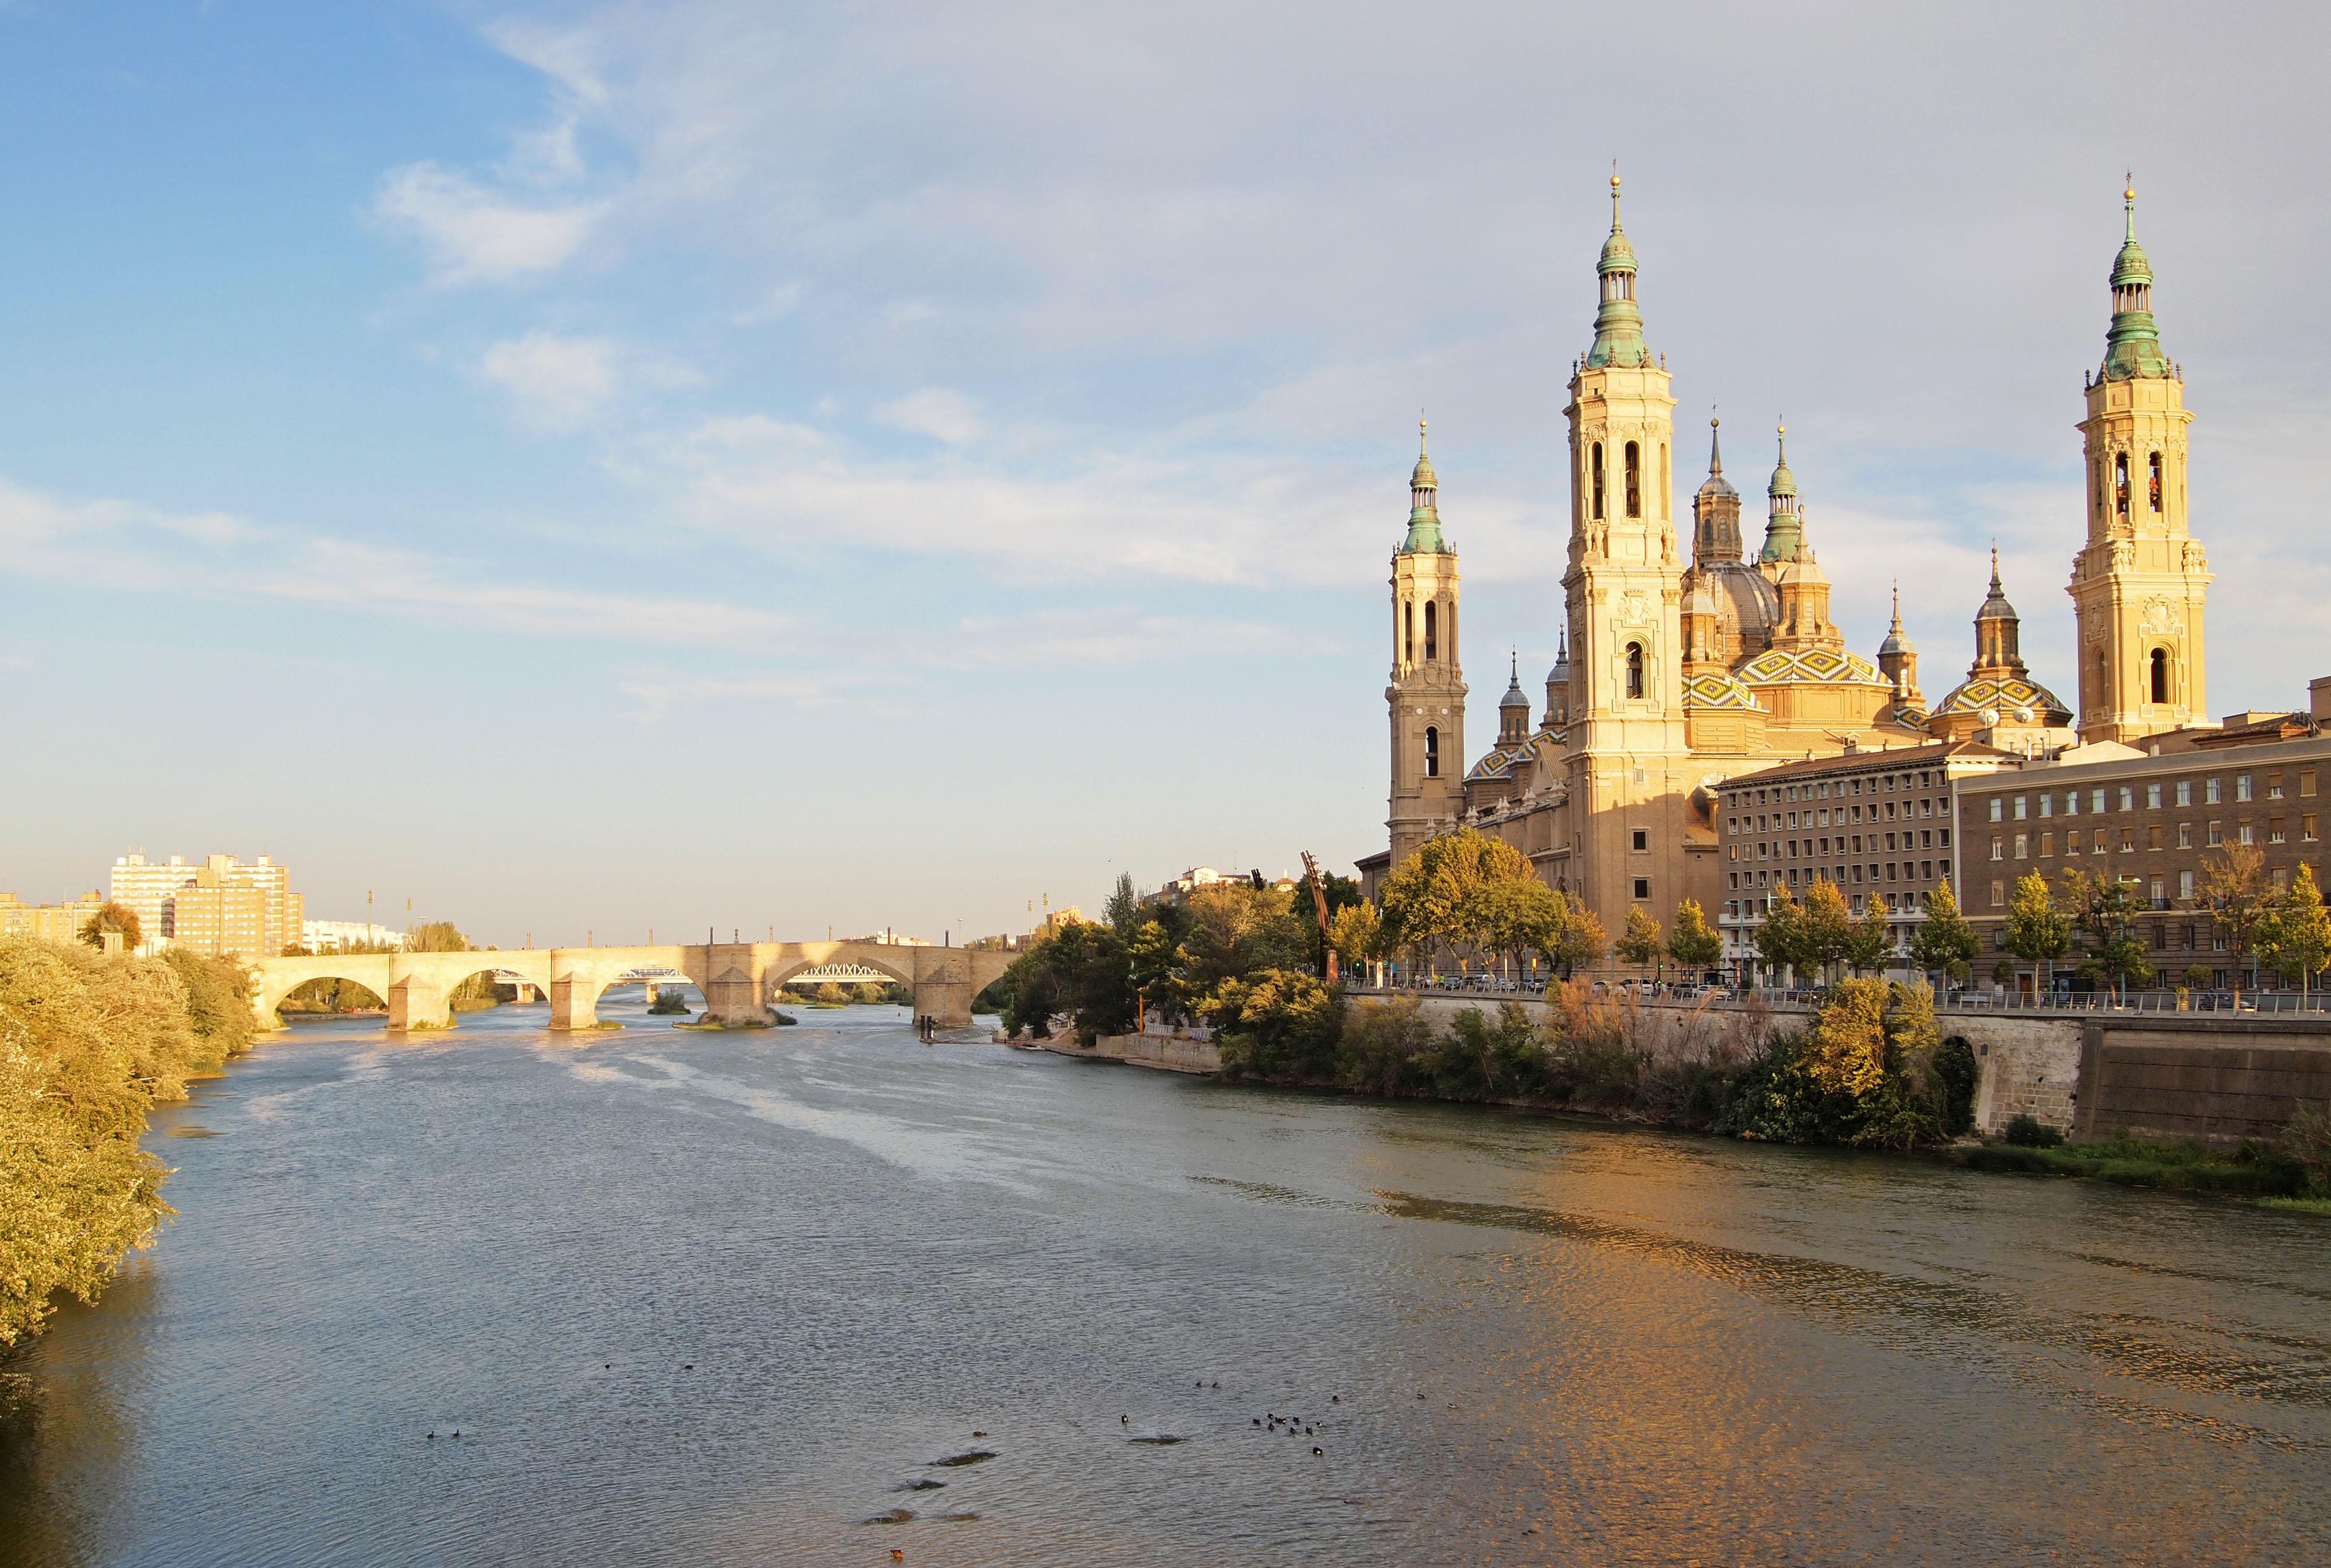 File:Zaragoza - Ebro.jpg - Wikimedia Commons